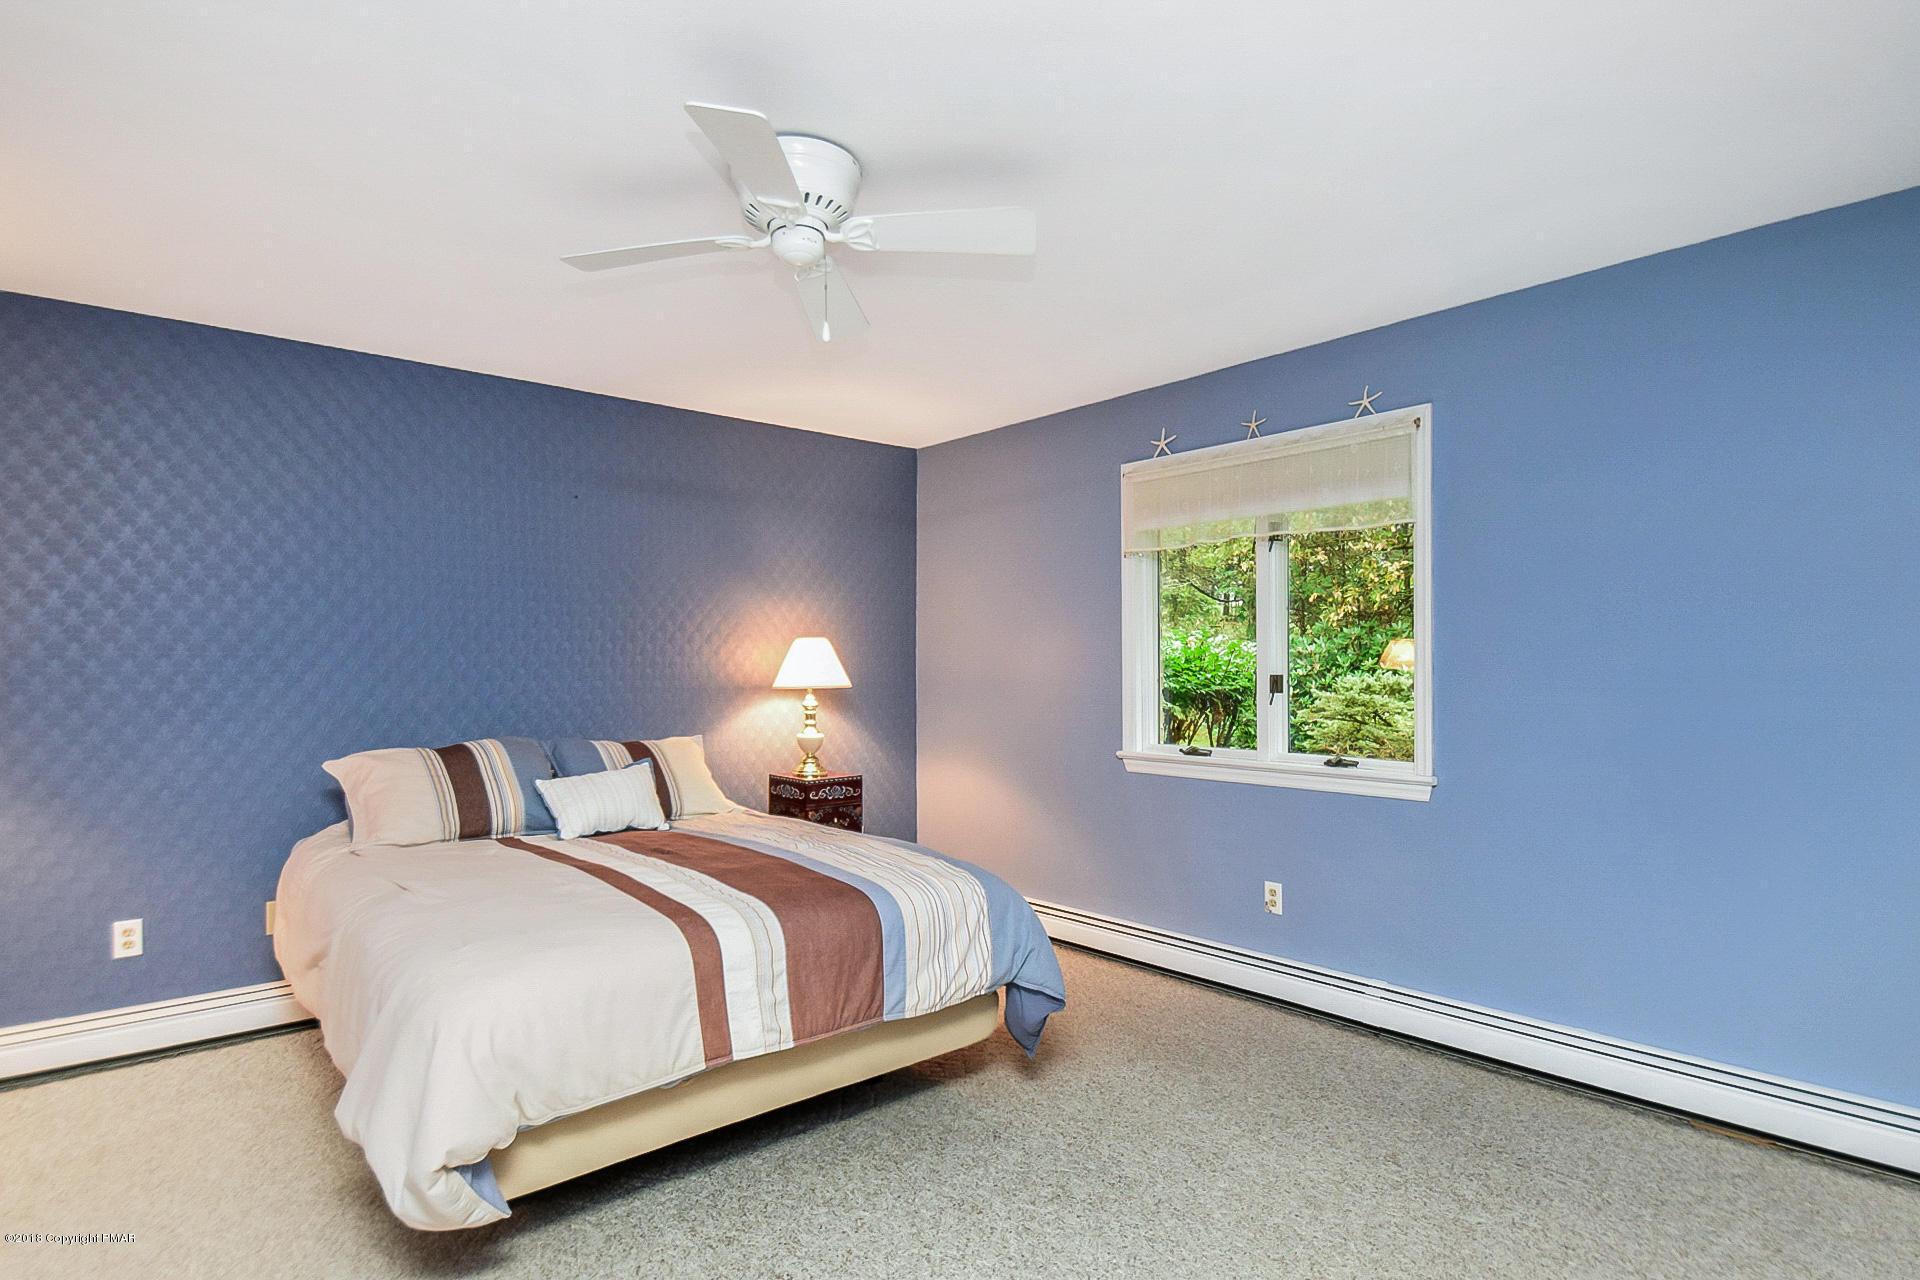 221 Winding Way, Saylorsburg, PA 18353